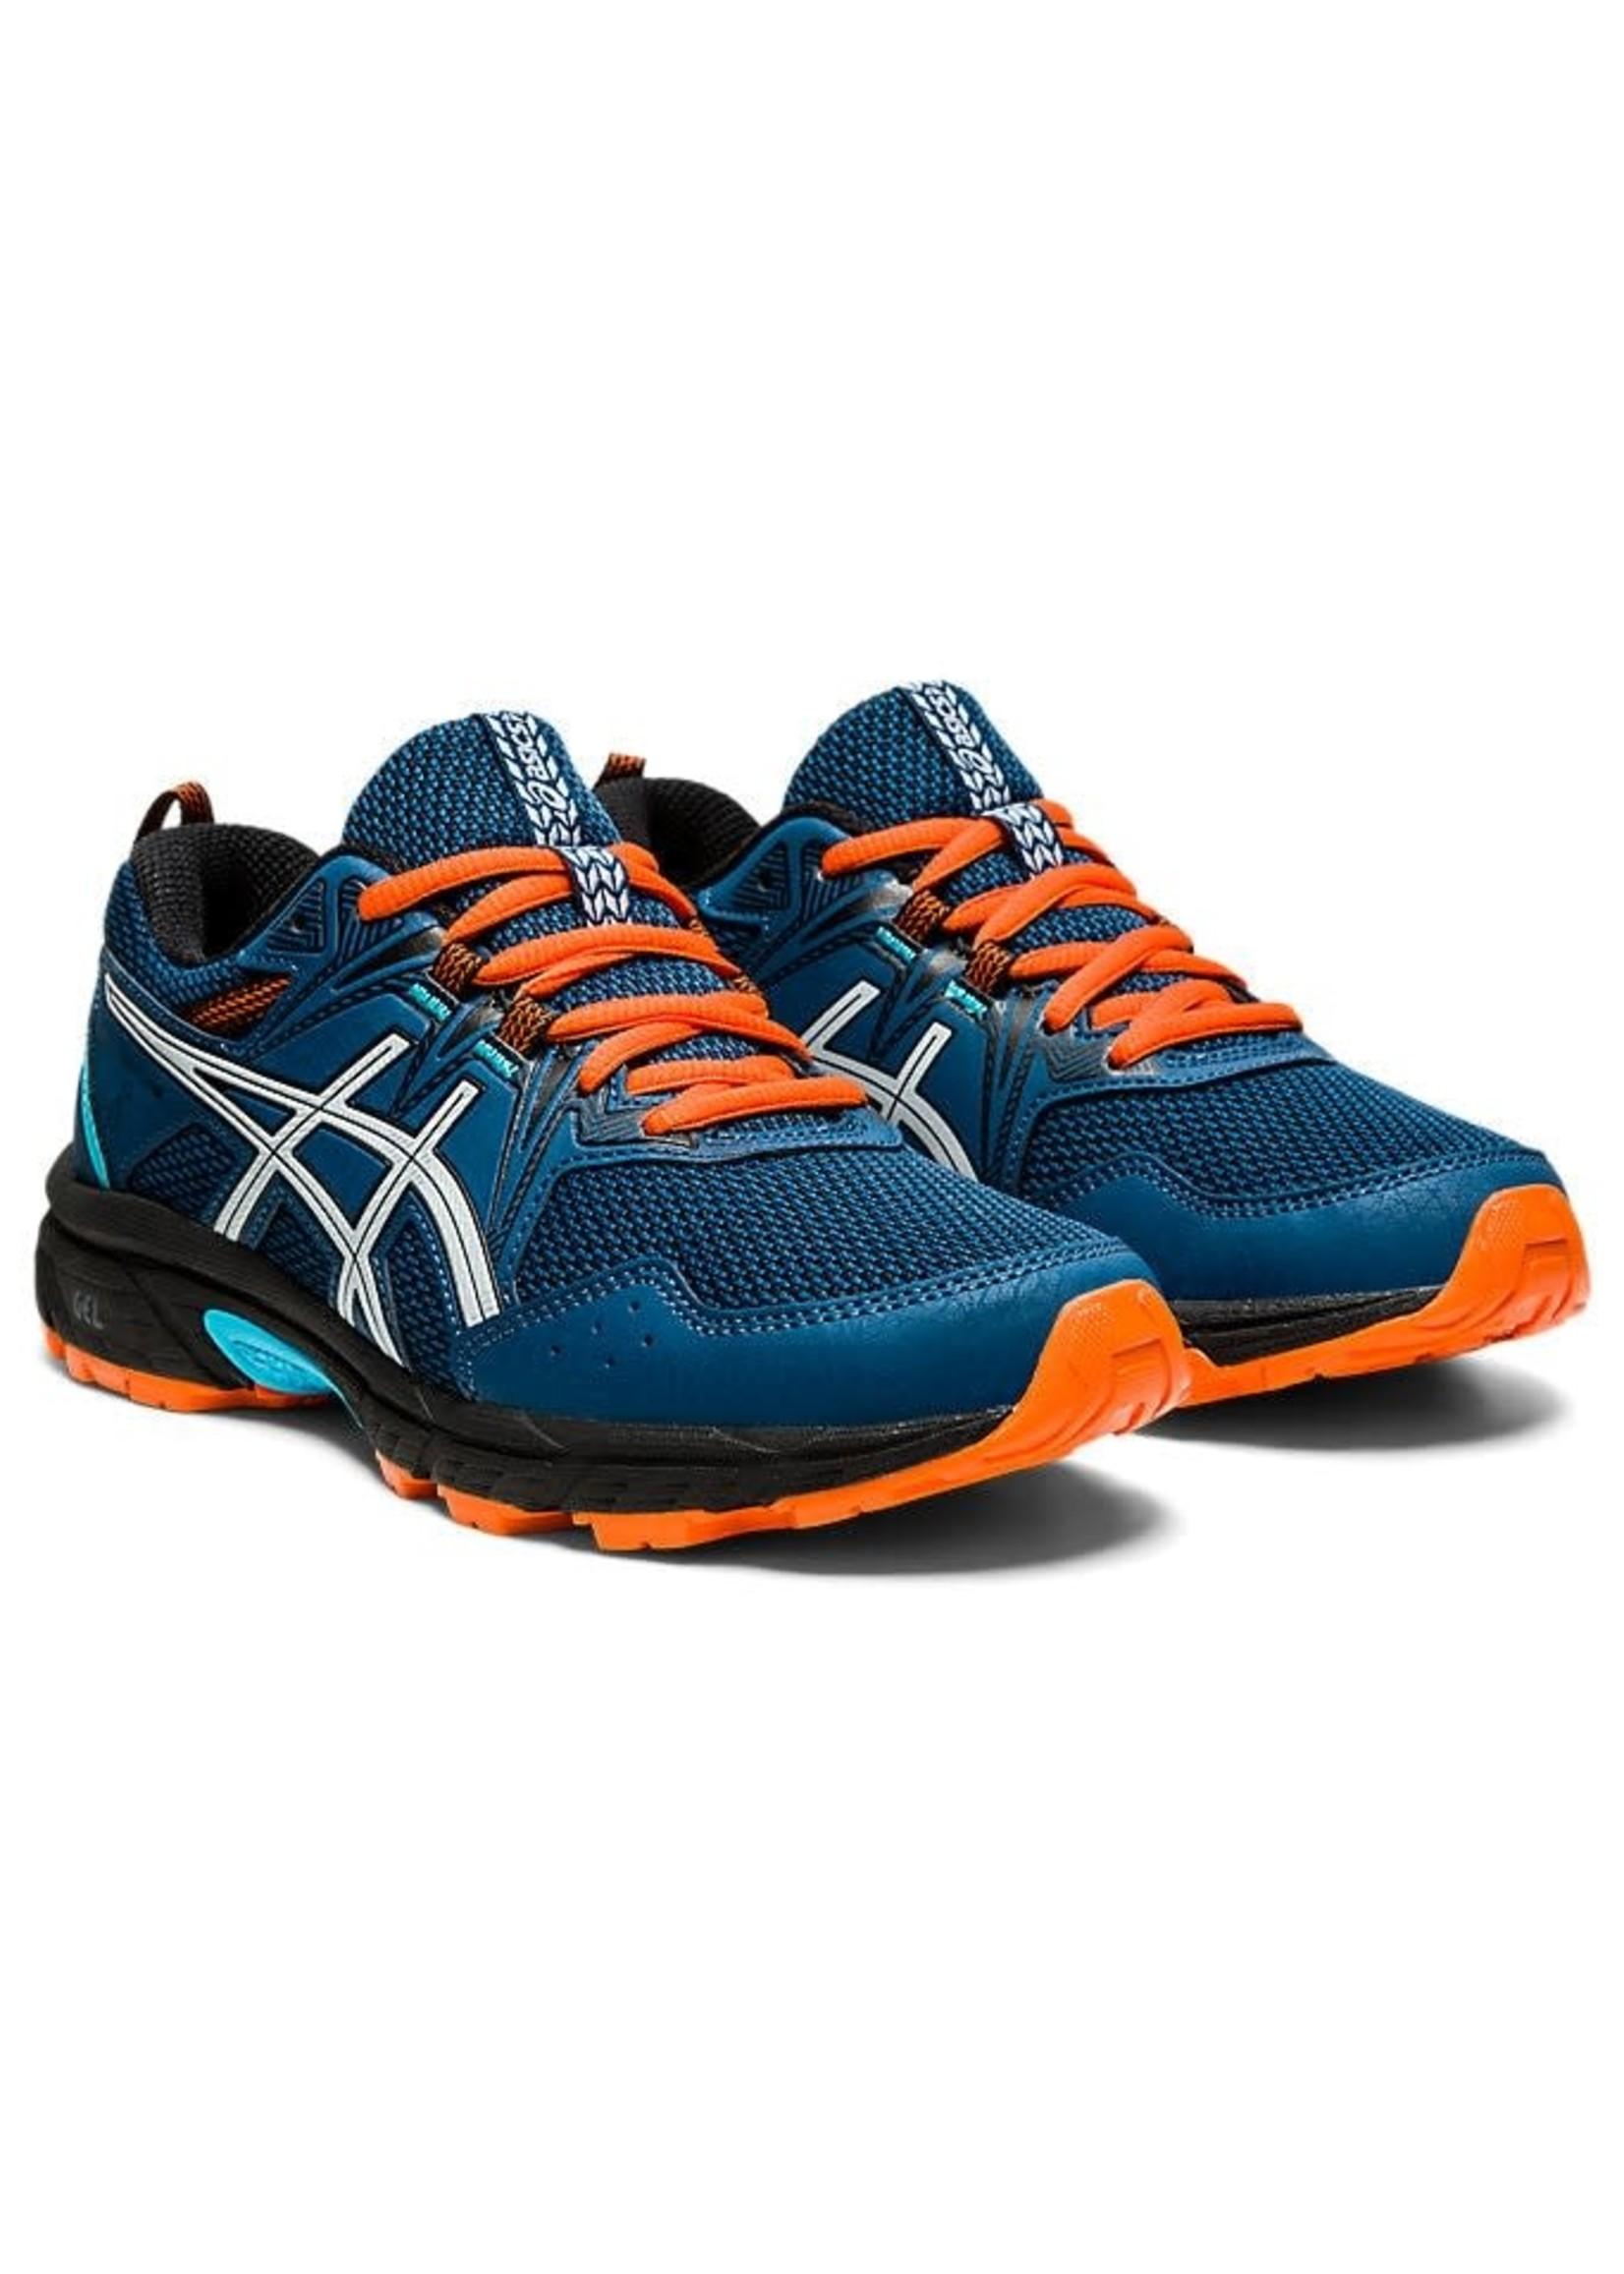 Asics Asics Gel - Venture 8 GS Junior Running Shoe